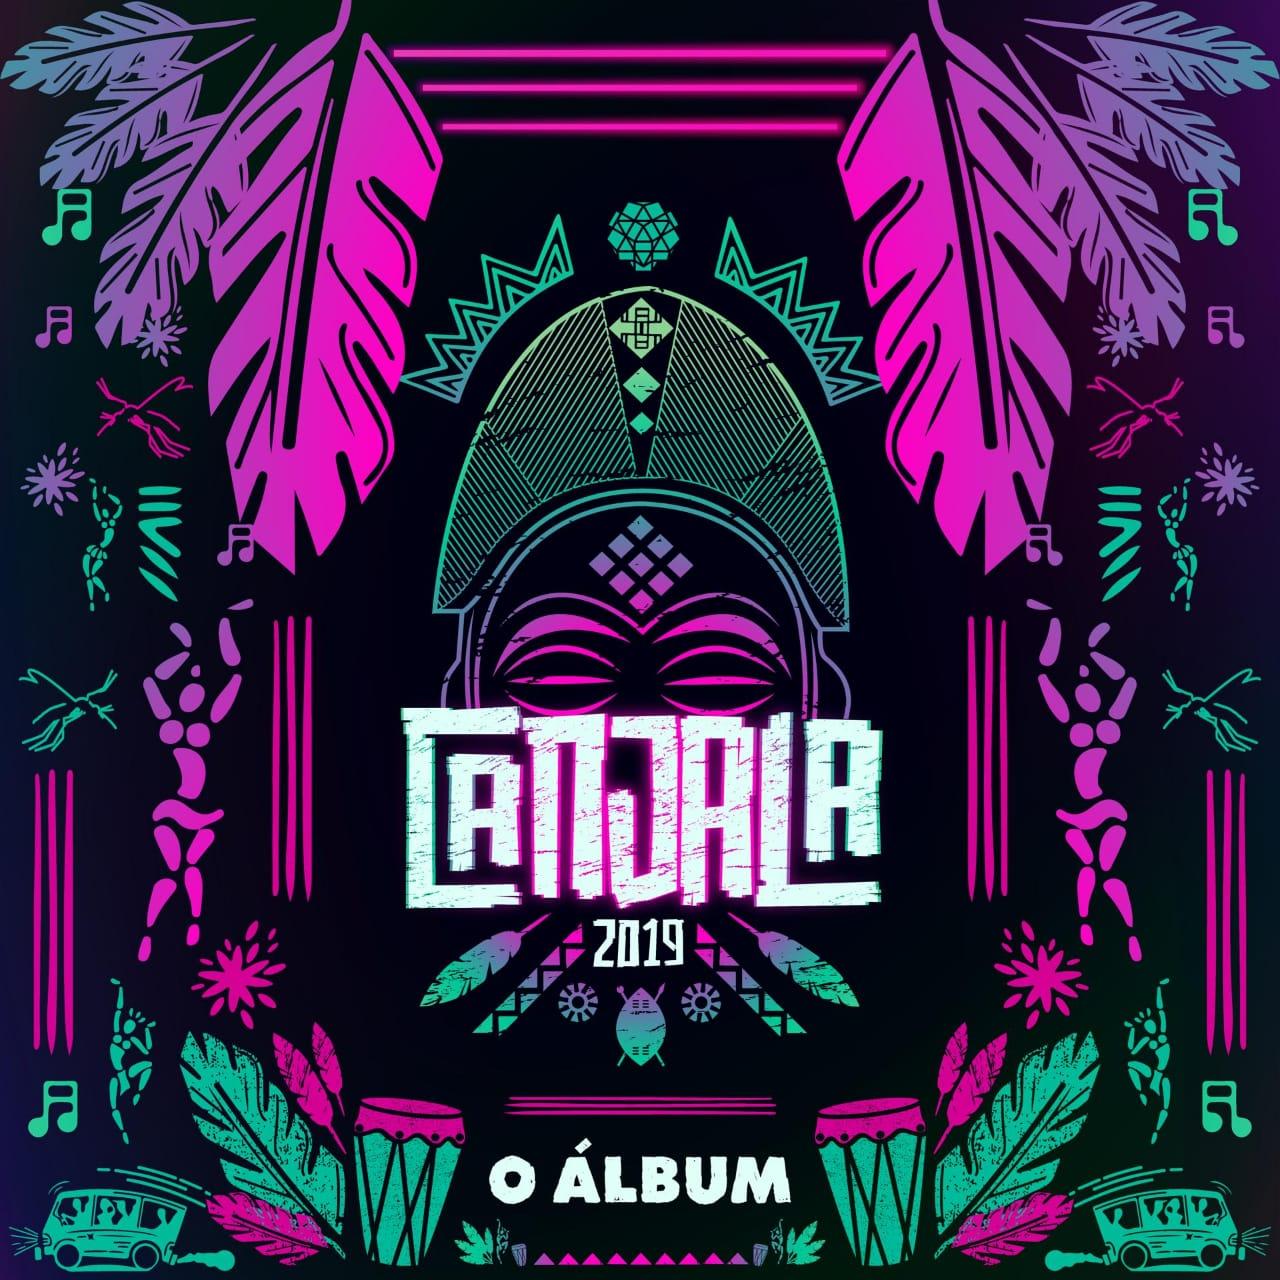 Canjala Album